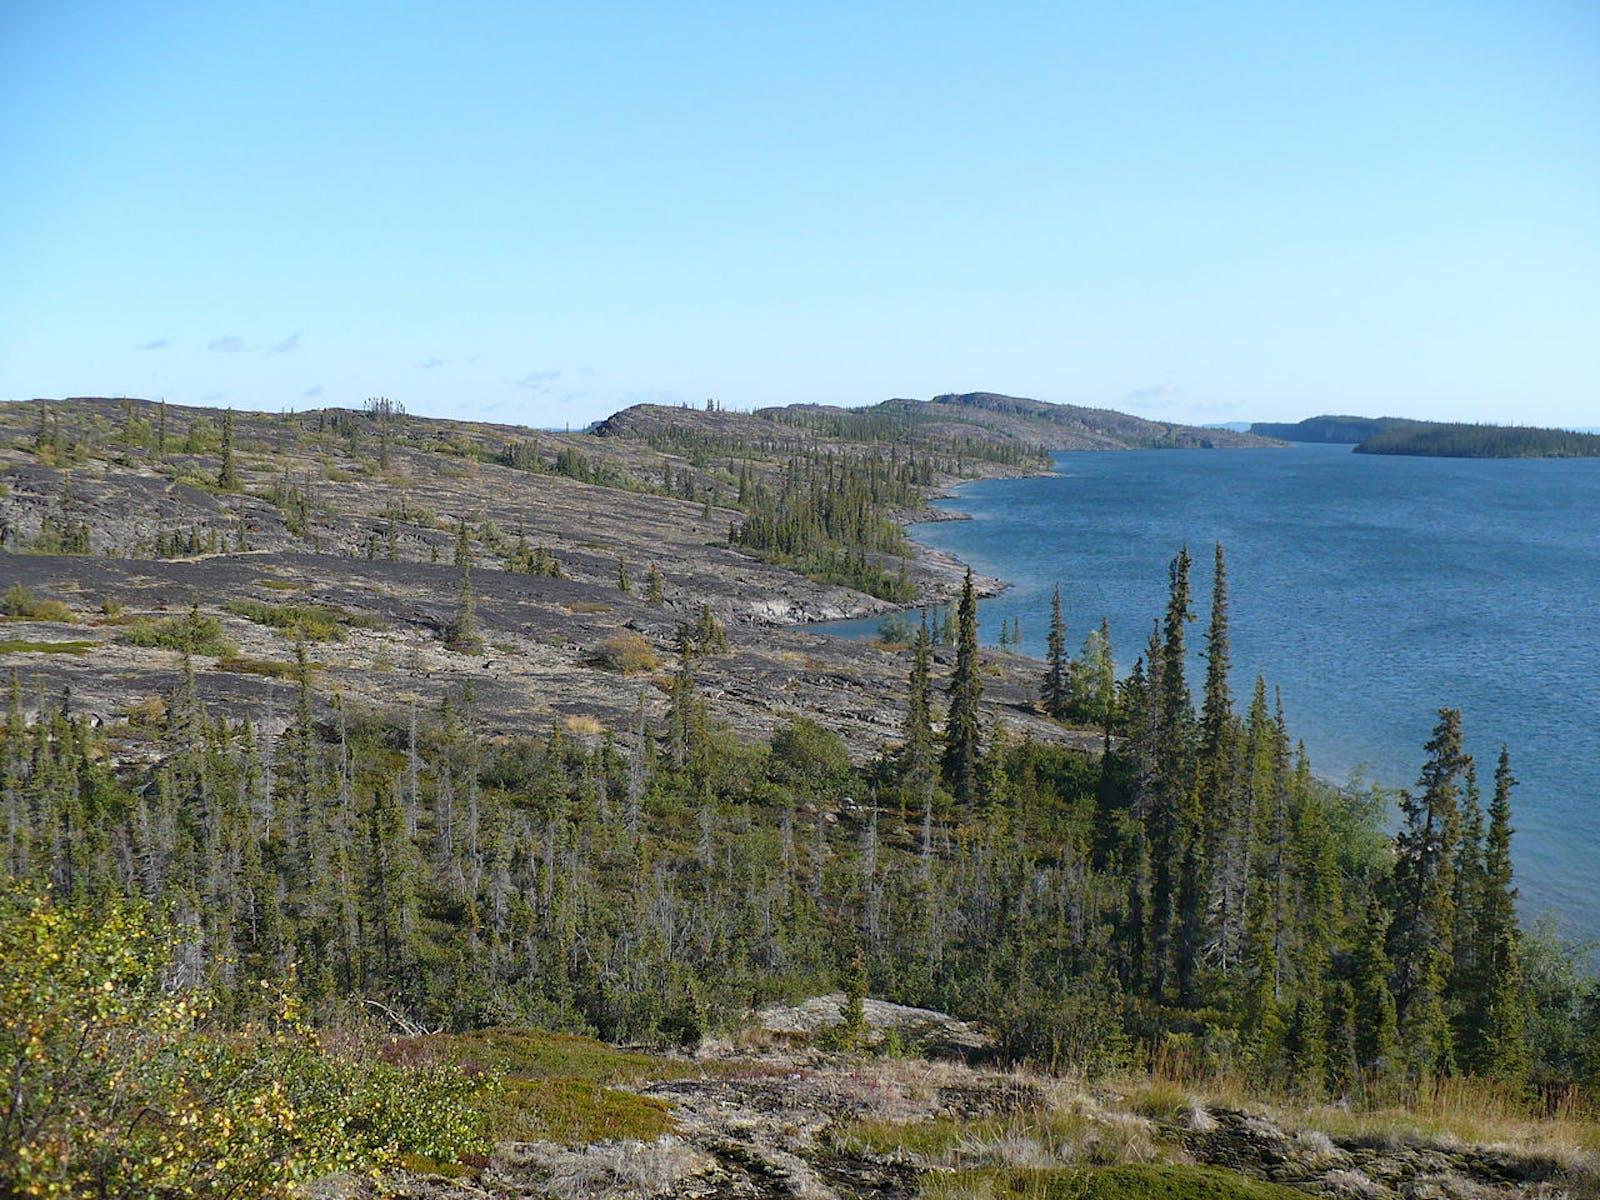 Northern Canadian Shield Taiga